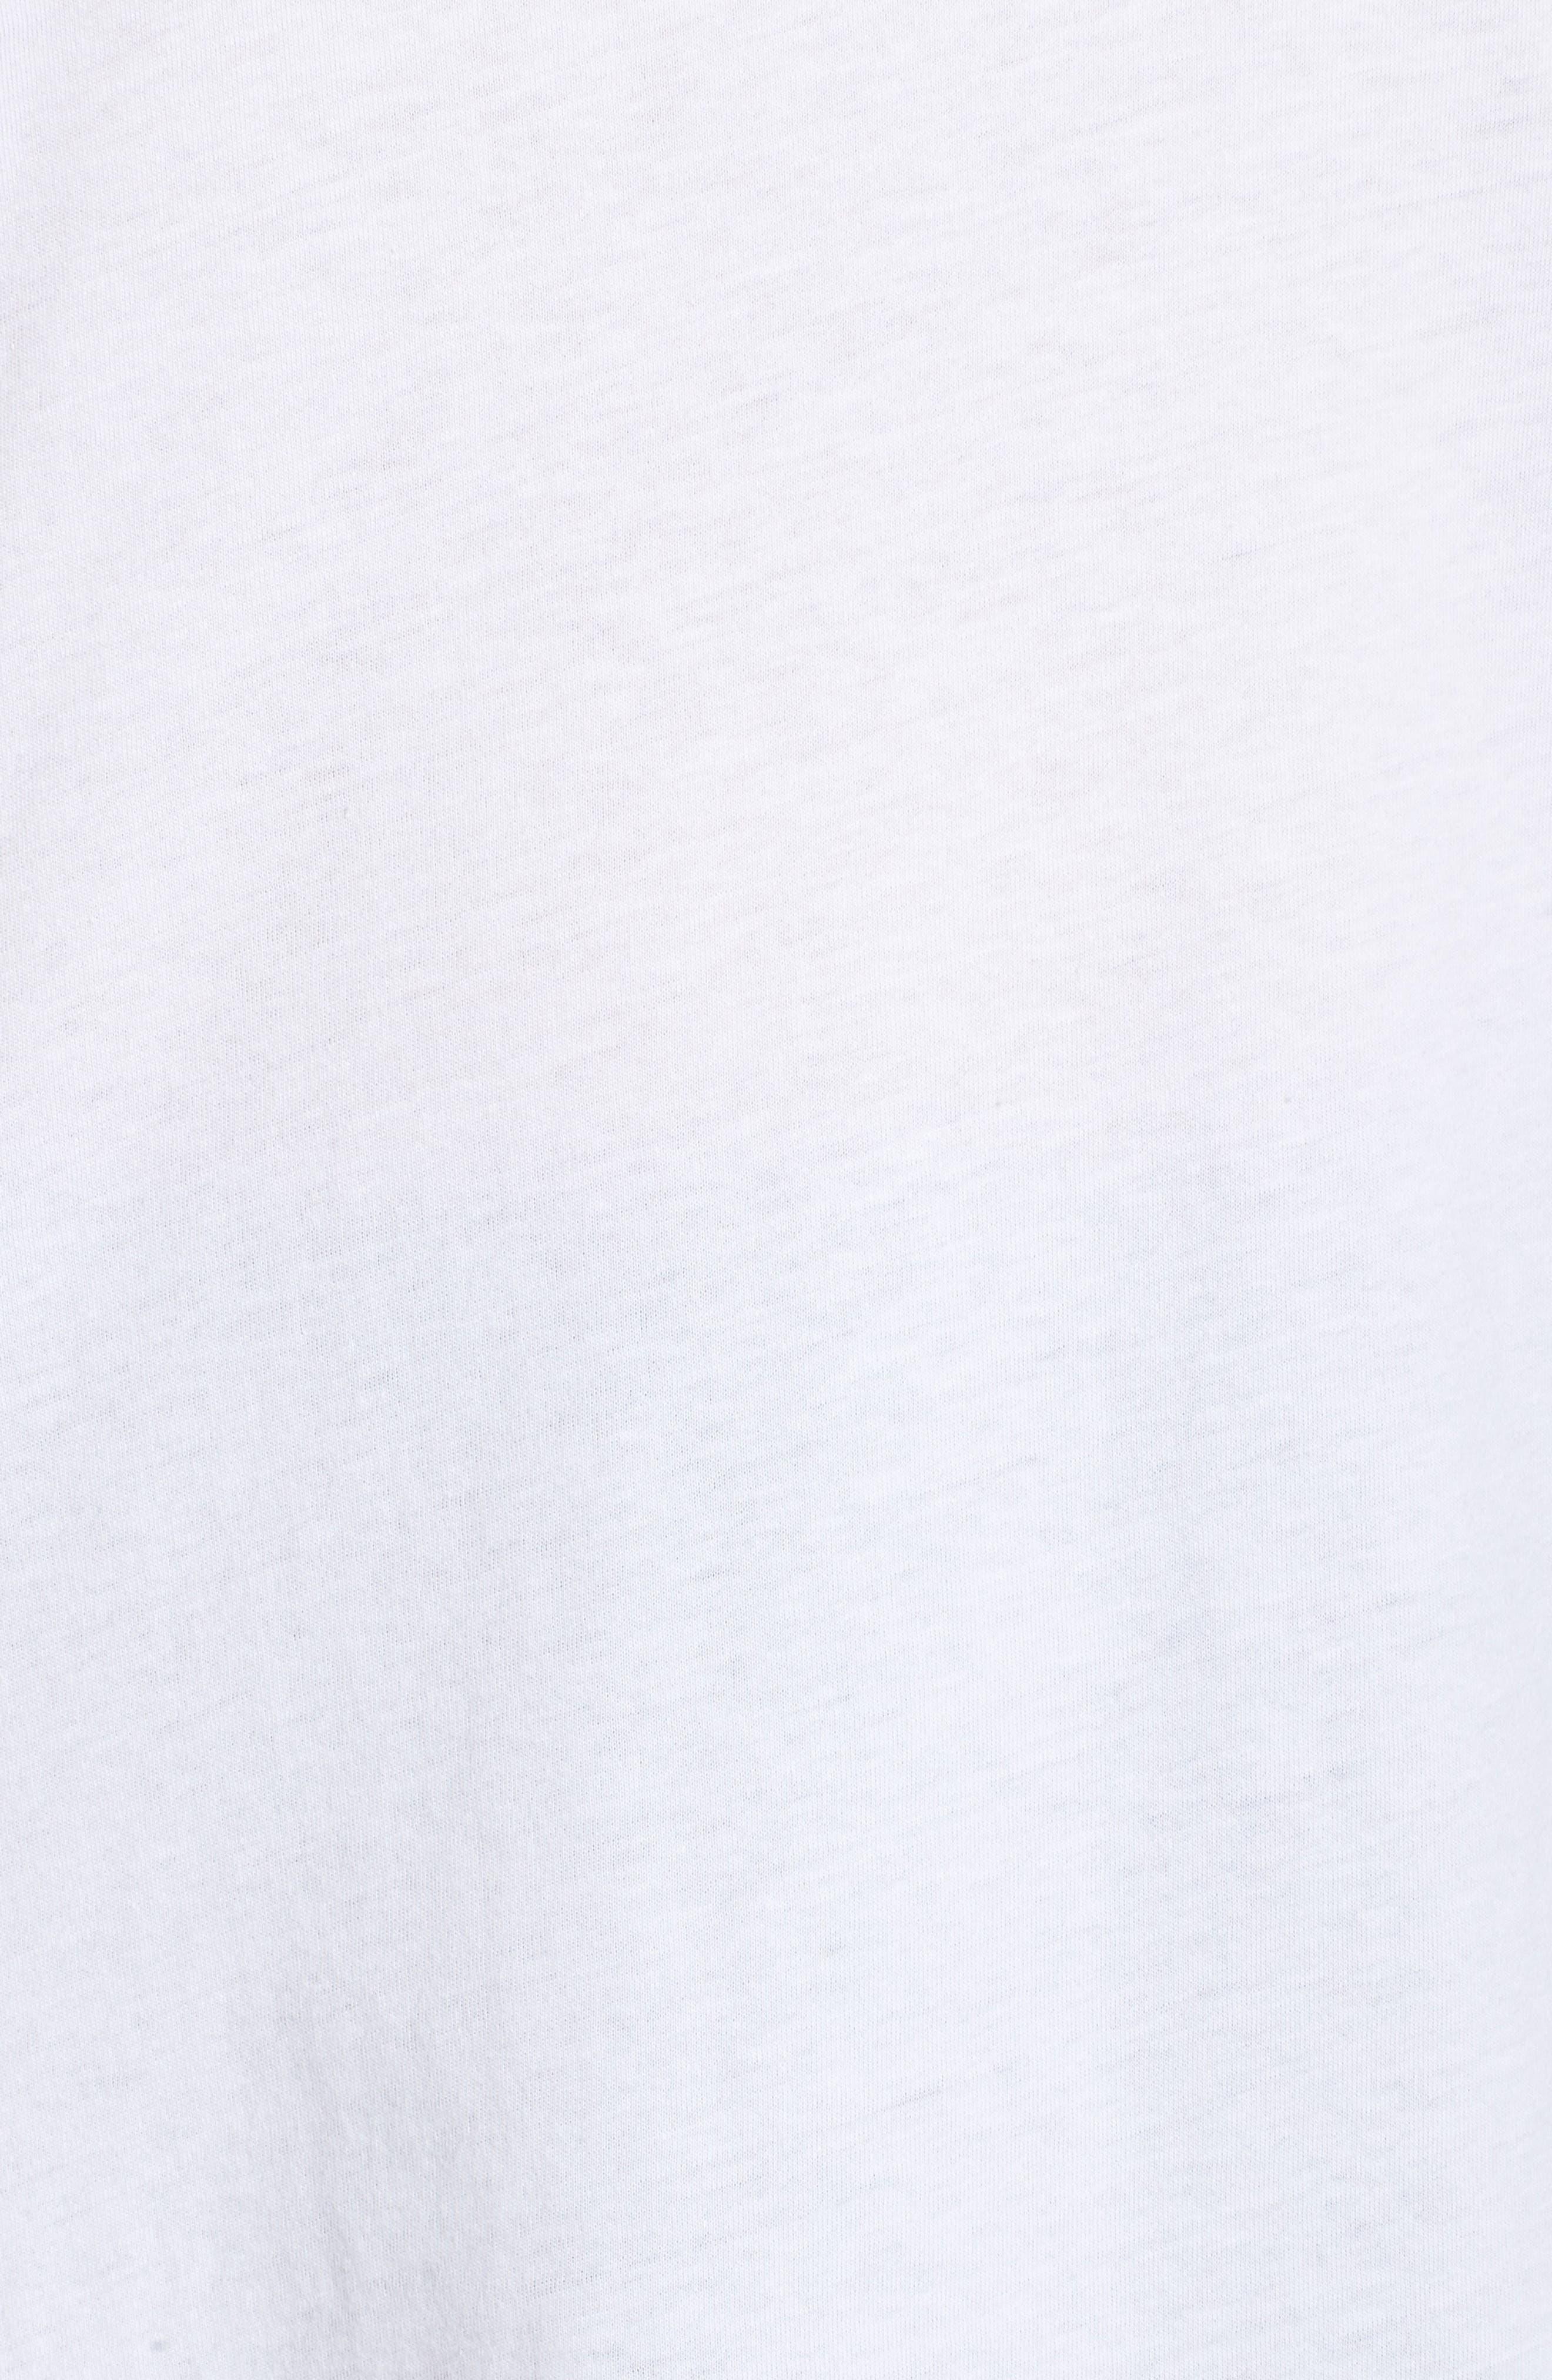 Varsity Stripe Cotton Tee,                             Alternate thumbnail 11, color,                             WHITE- BURGUNDY FIG COMBO